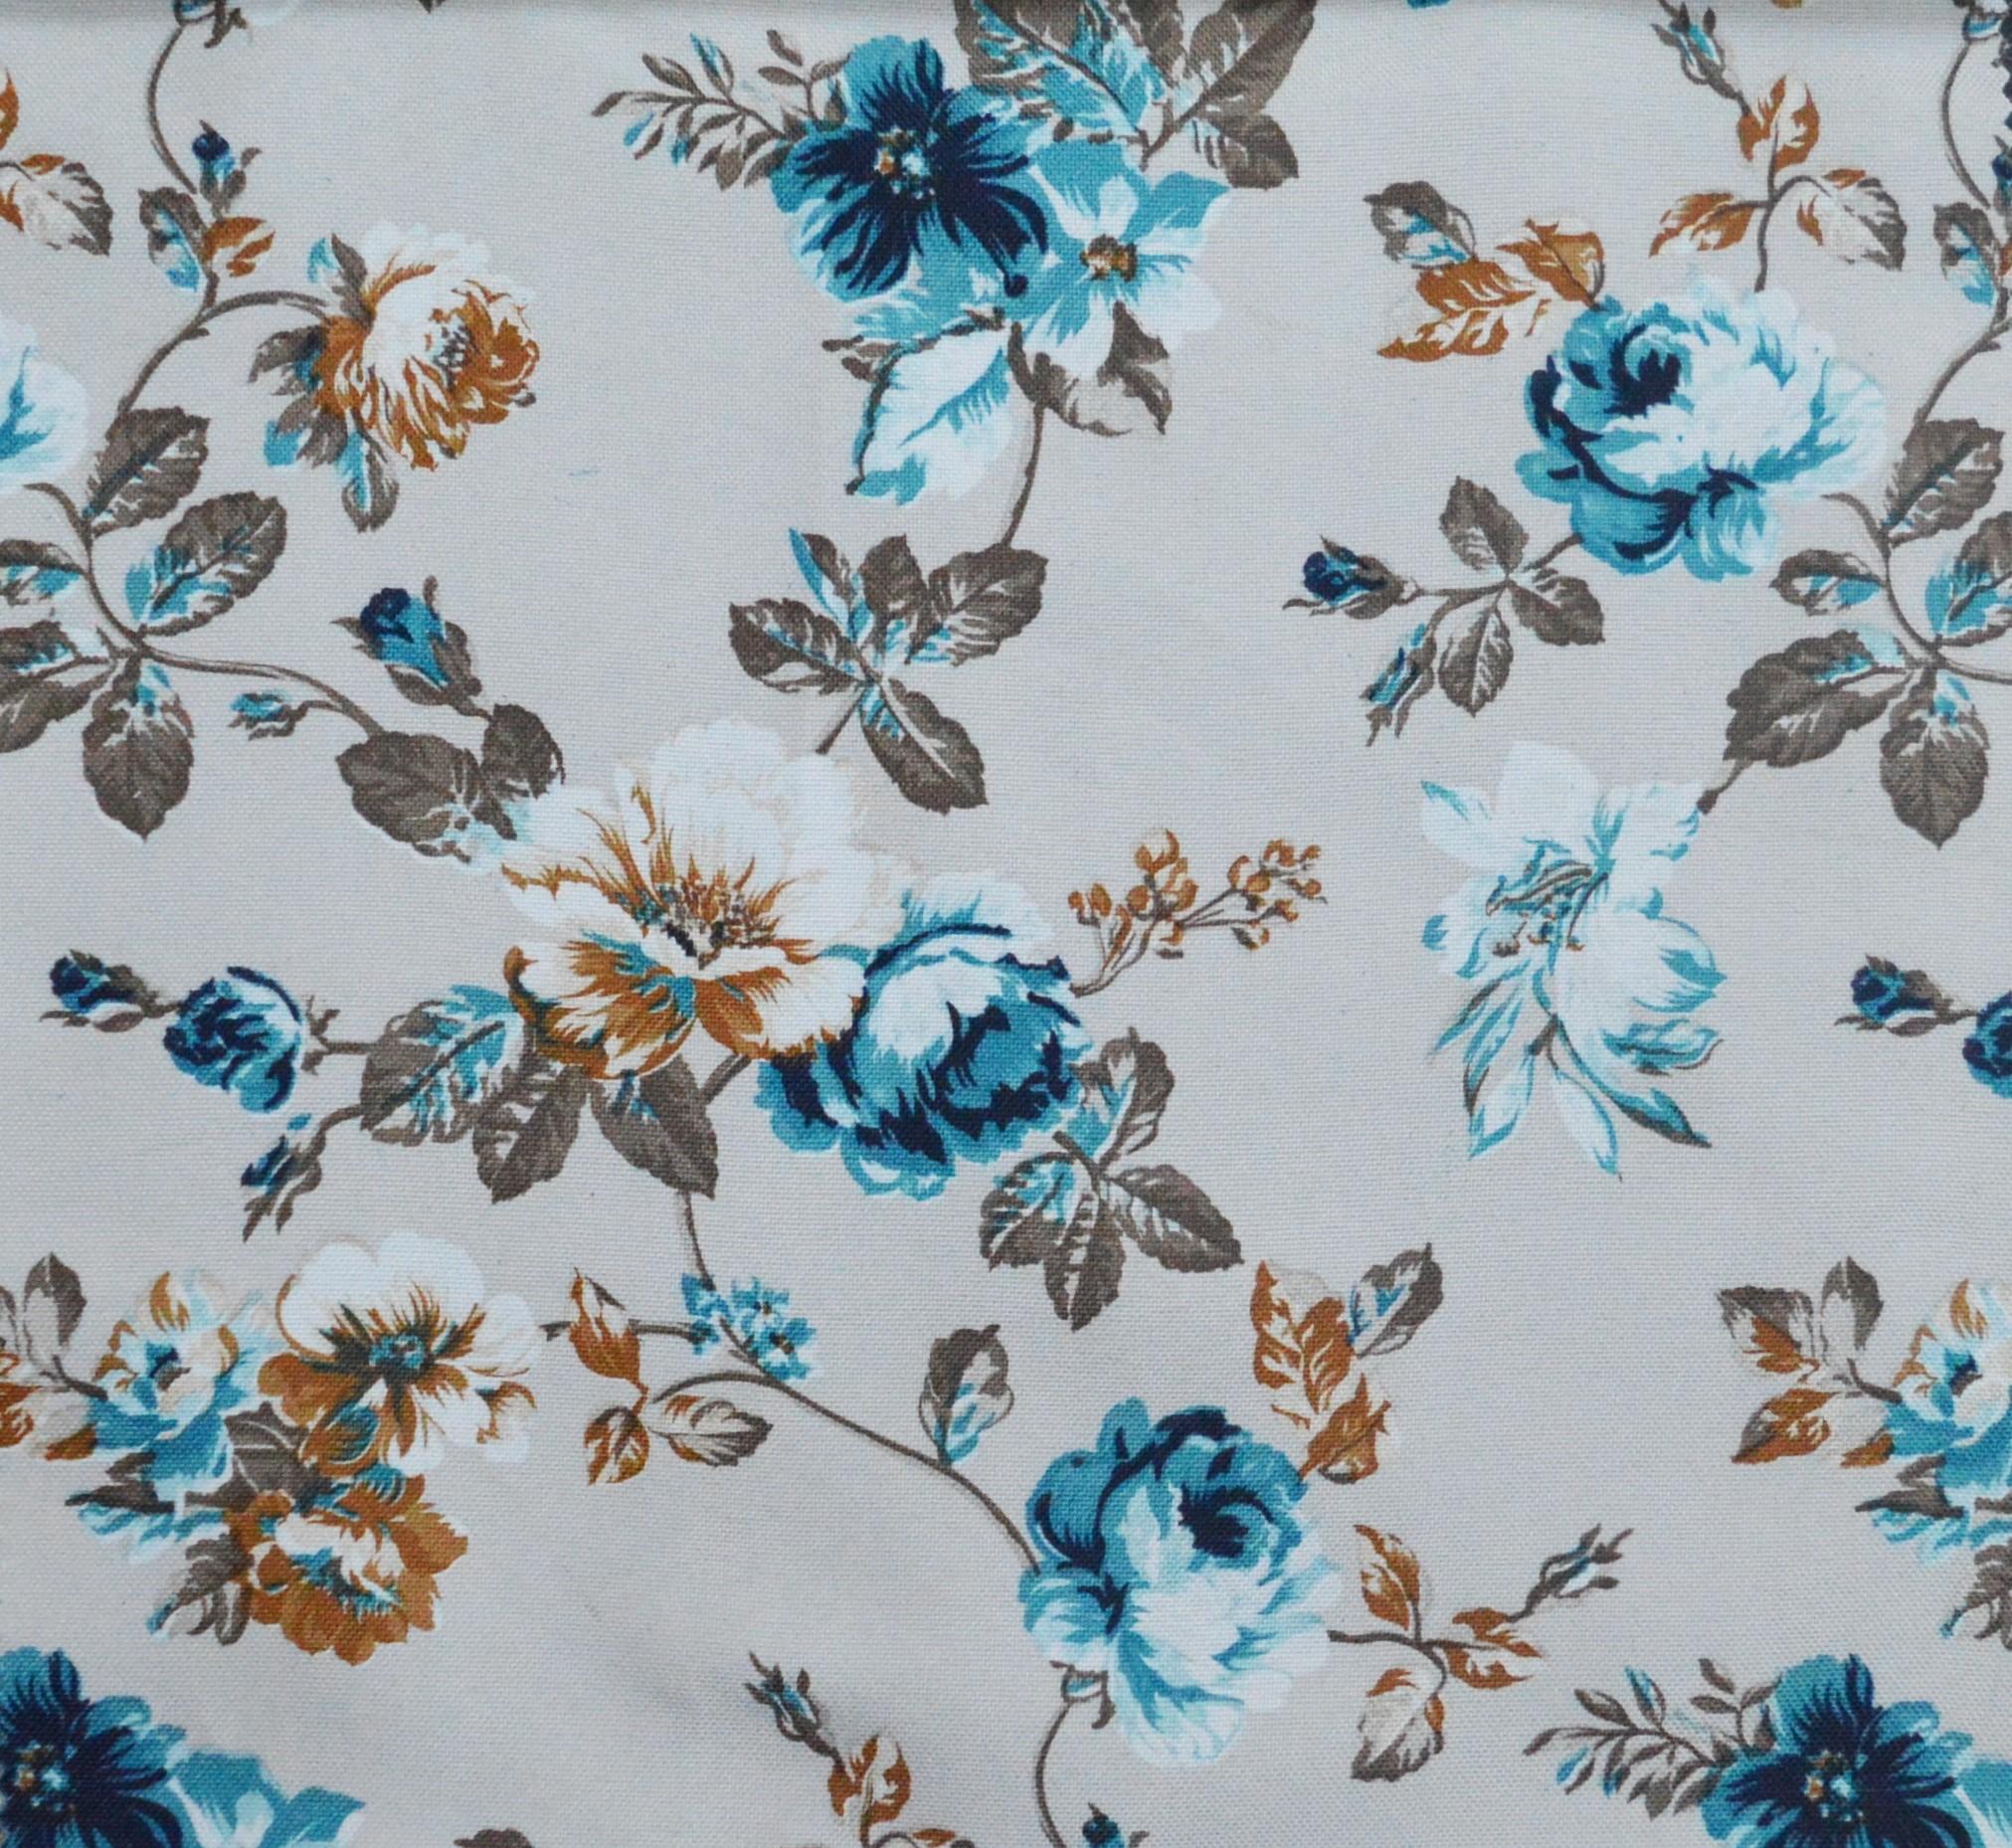 blossom floral curtain fabric blue autumn